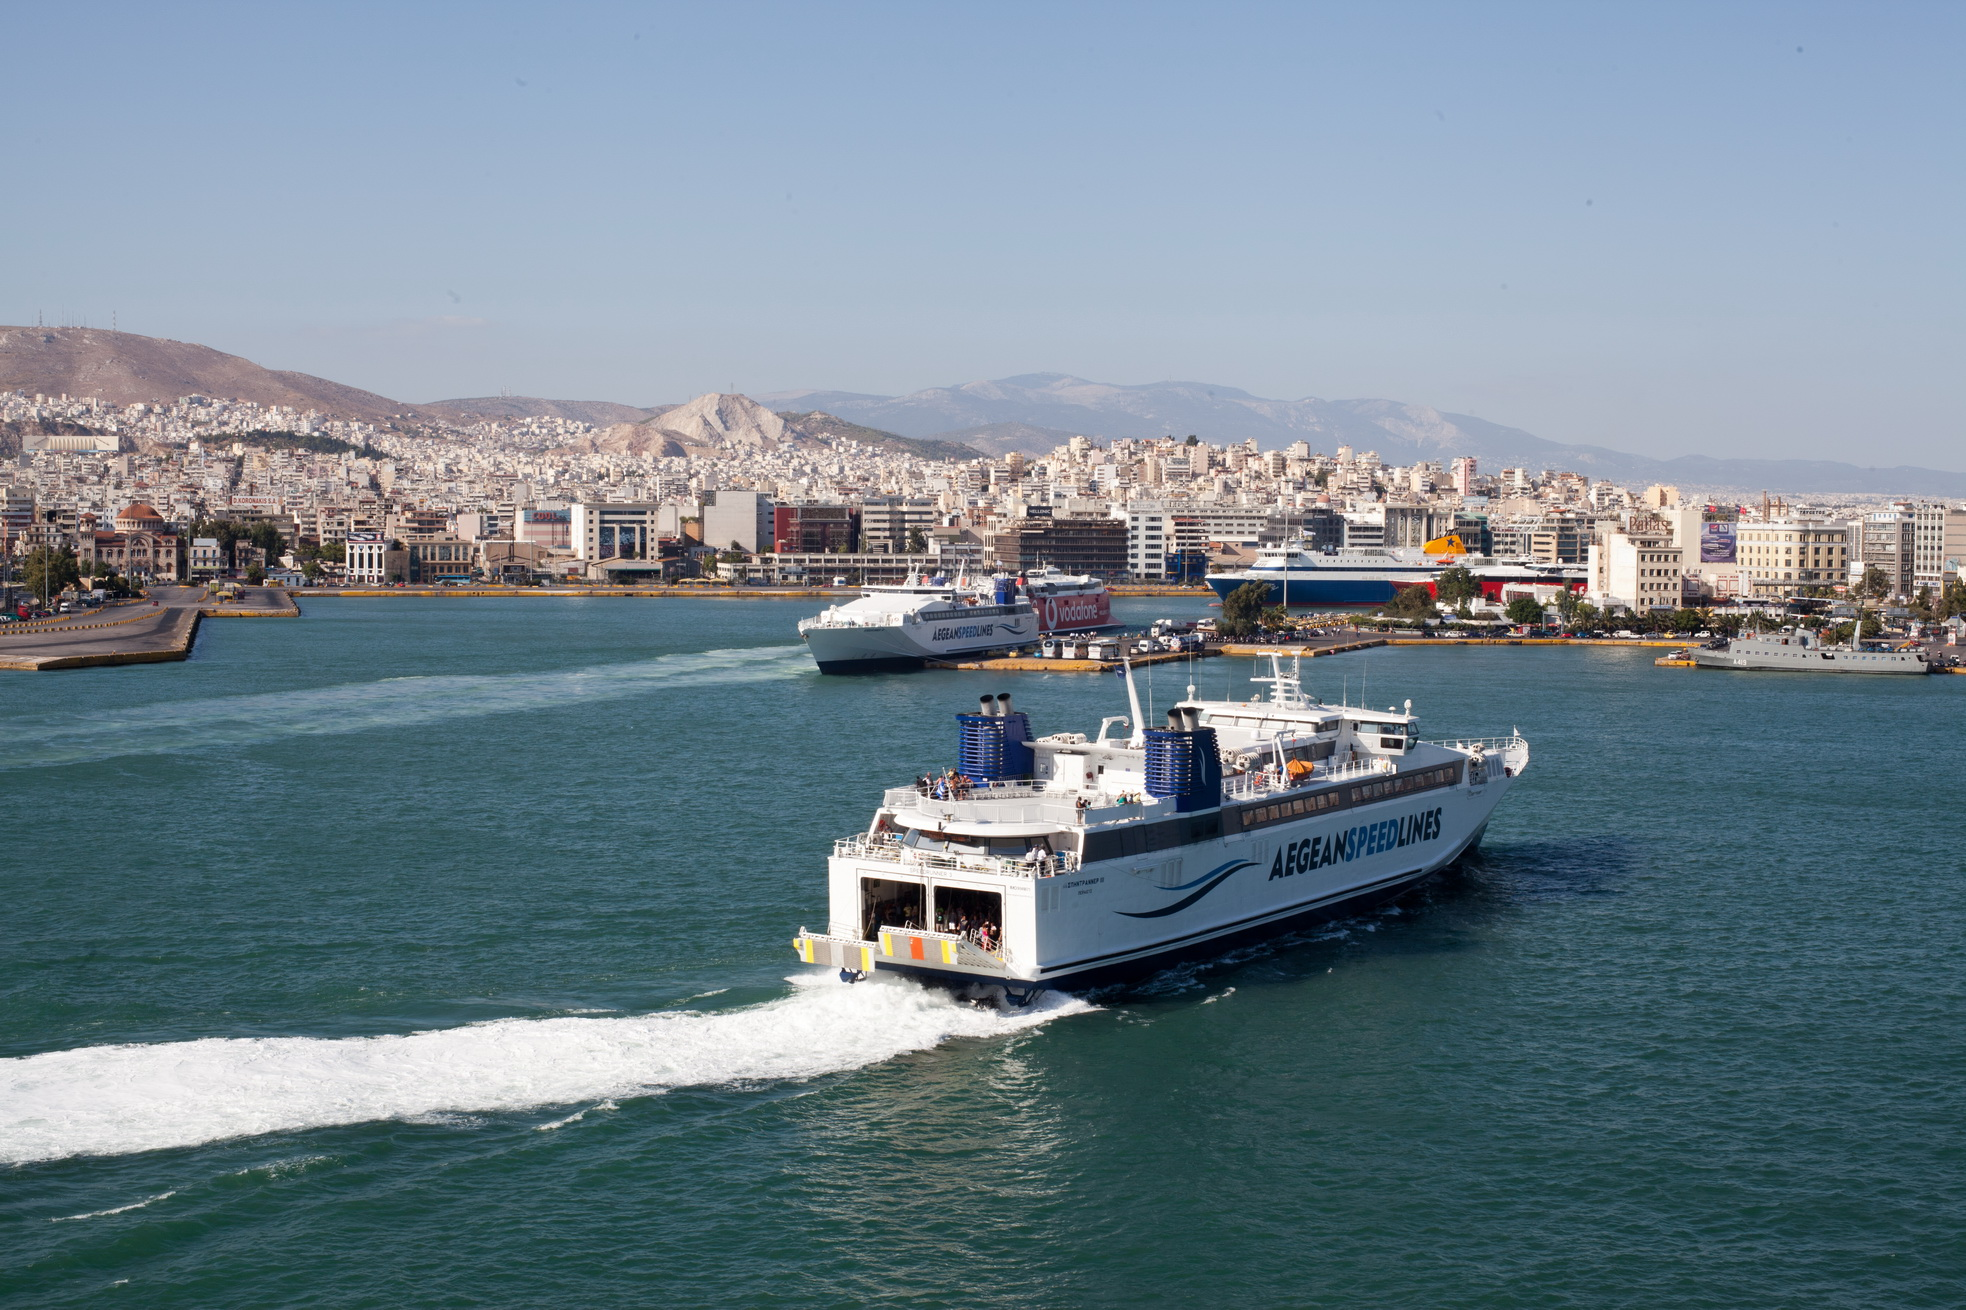 MS Speedrunner III IMO 9141871 Aegean Speed Lines entering Piraeus Port of Athens Greece 03